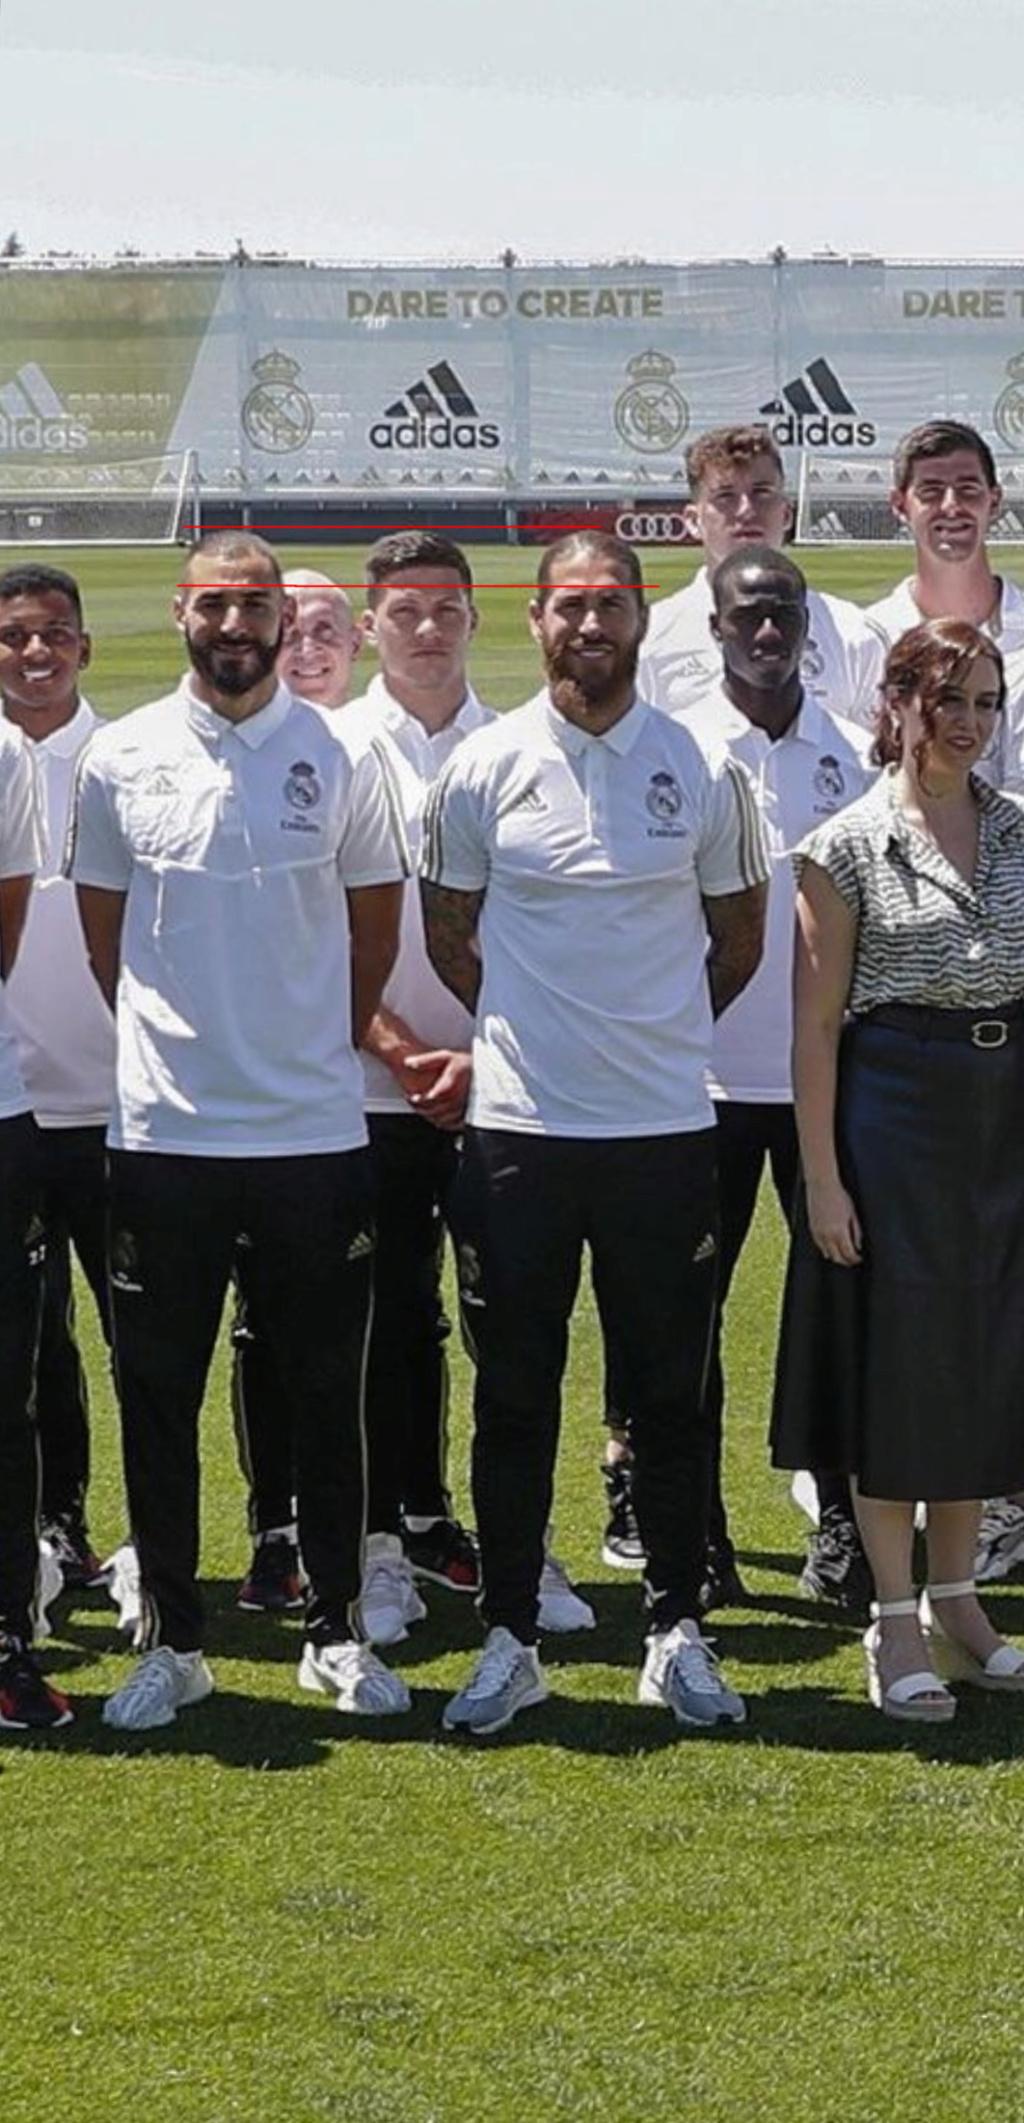 ¿Cuánto mide Karim Benzema? - Altura - Real height 84_sin10